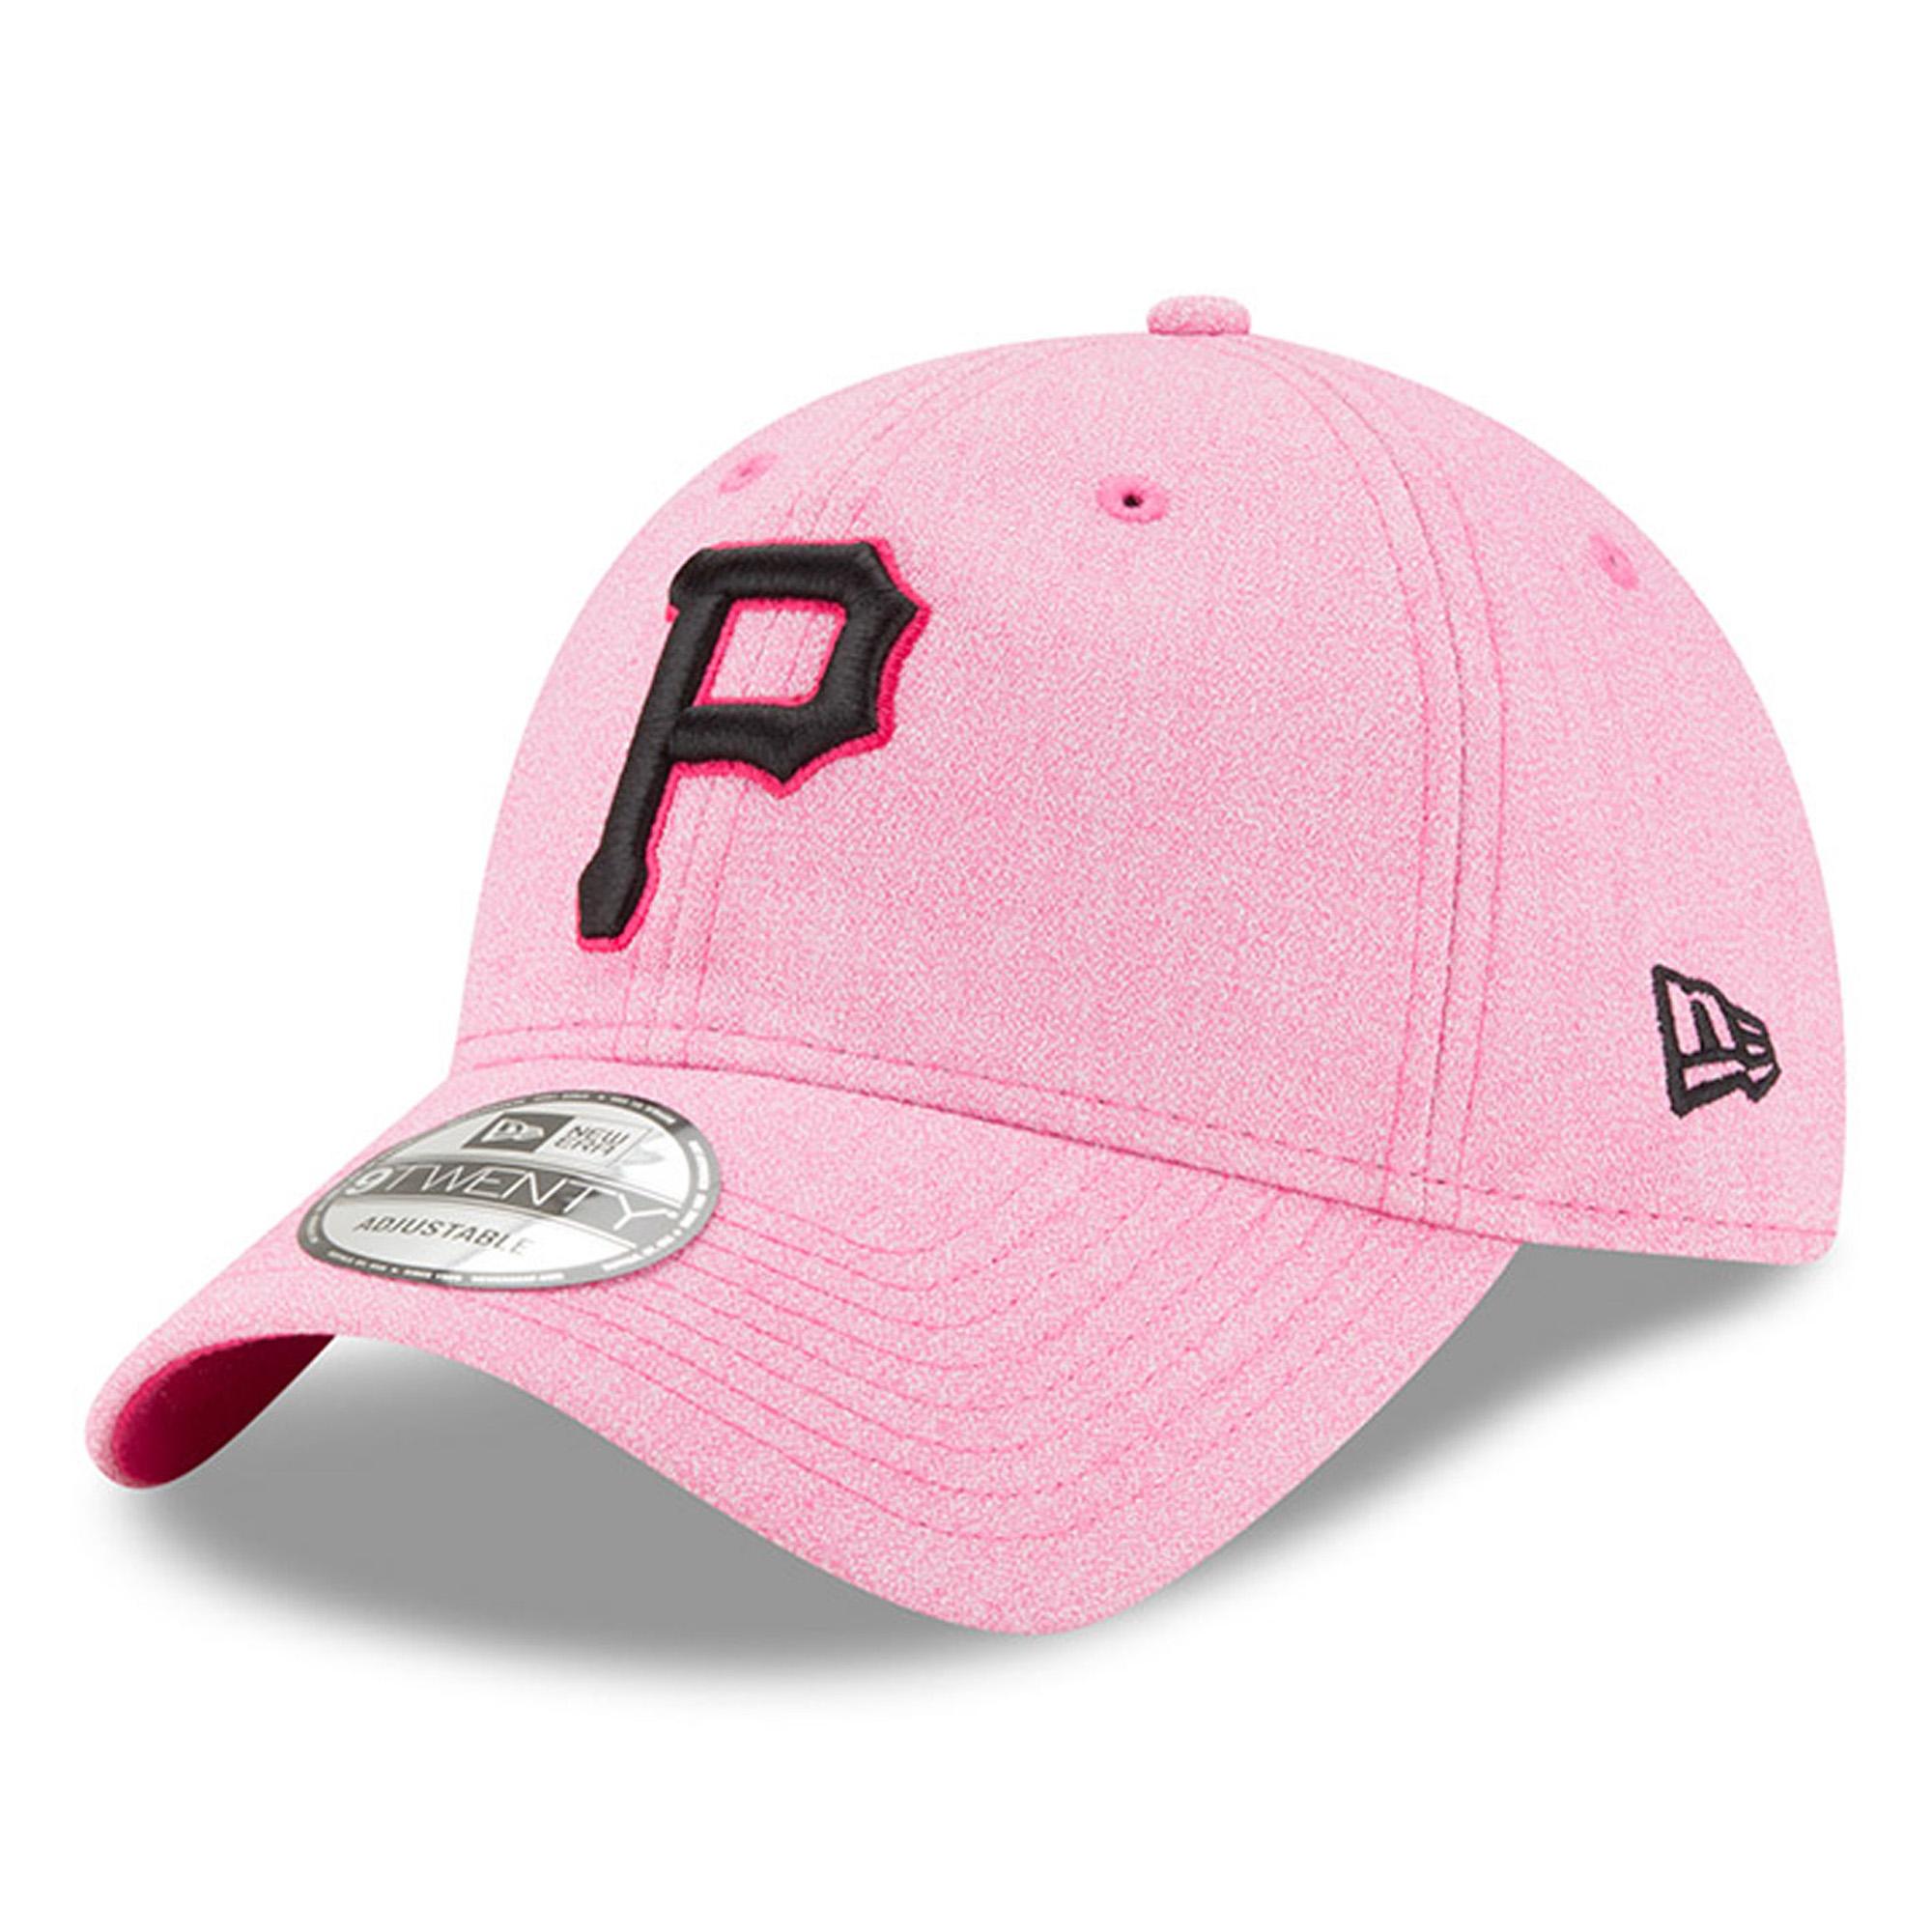 Pittsburgh Pirates New Era 2018 Mother's Day 9TWENTY Adjustable Hat - Pink - OSFA